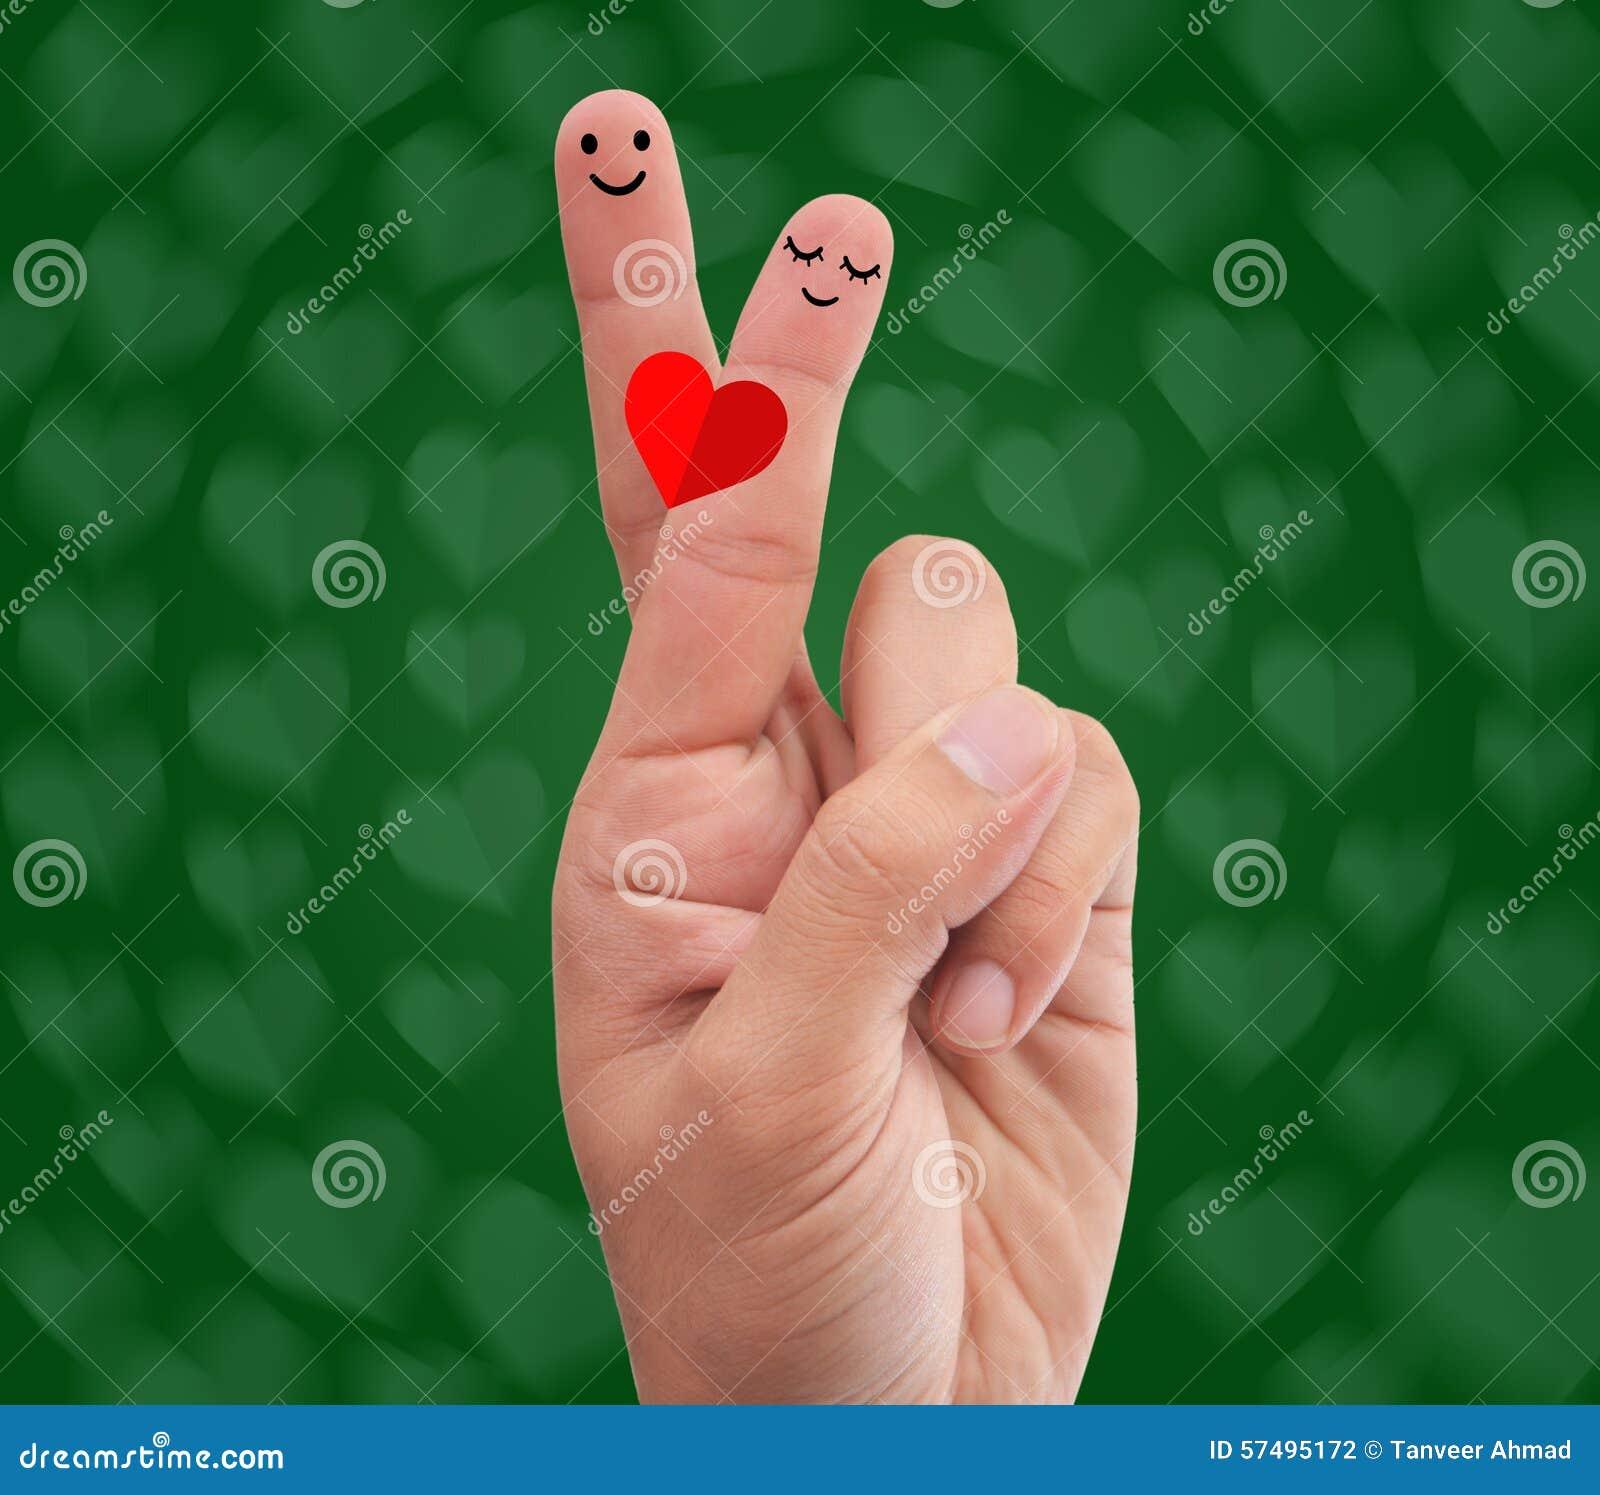 Fingers Crossed Making Romantic Pose Stock Photo Image Of Romance